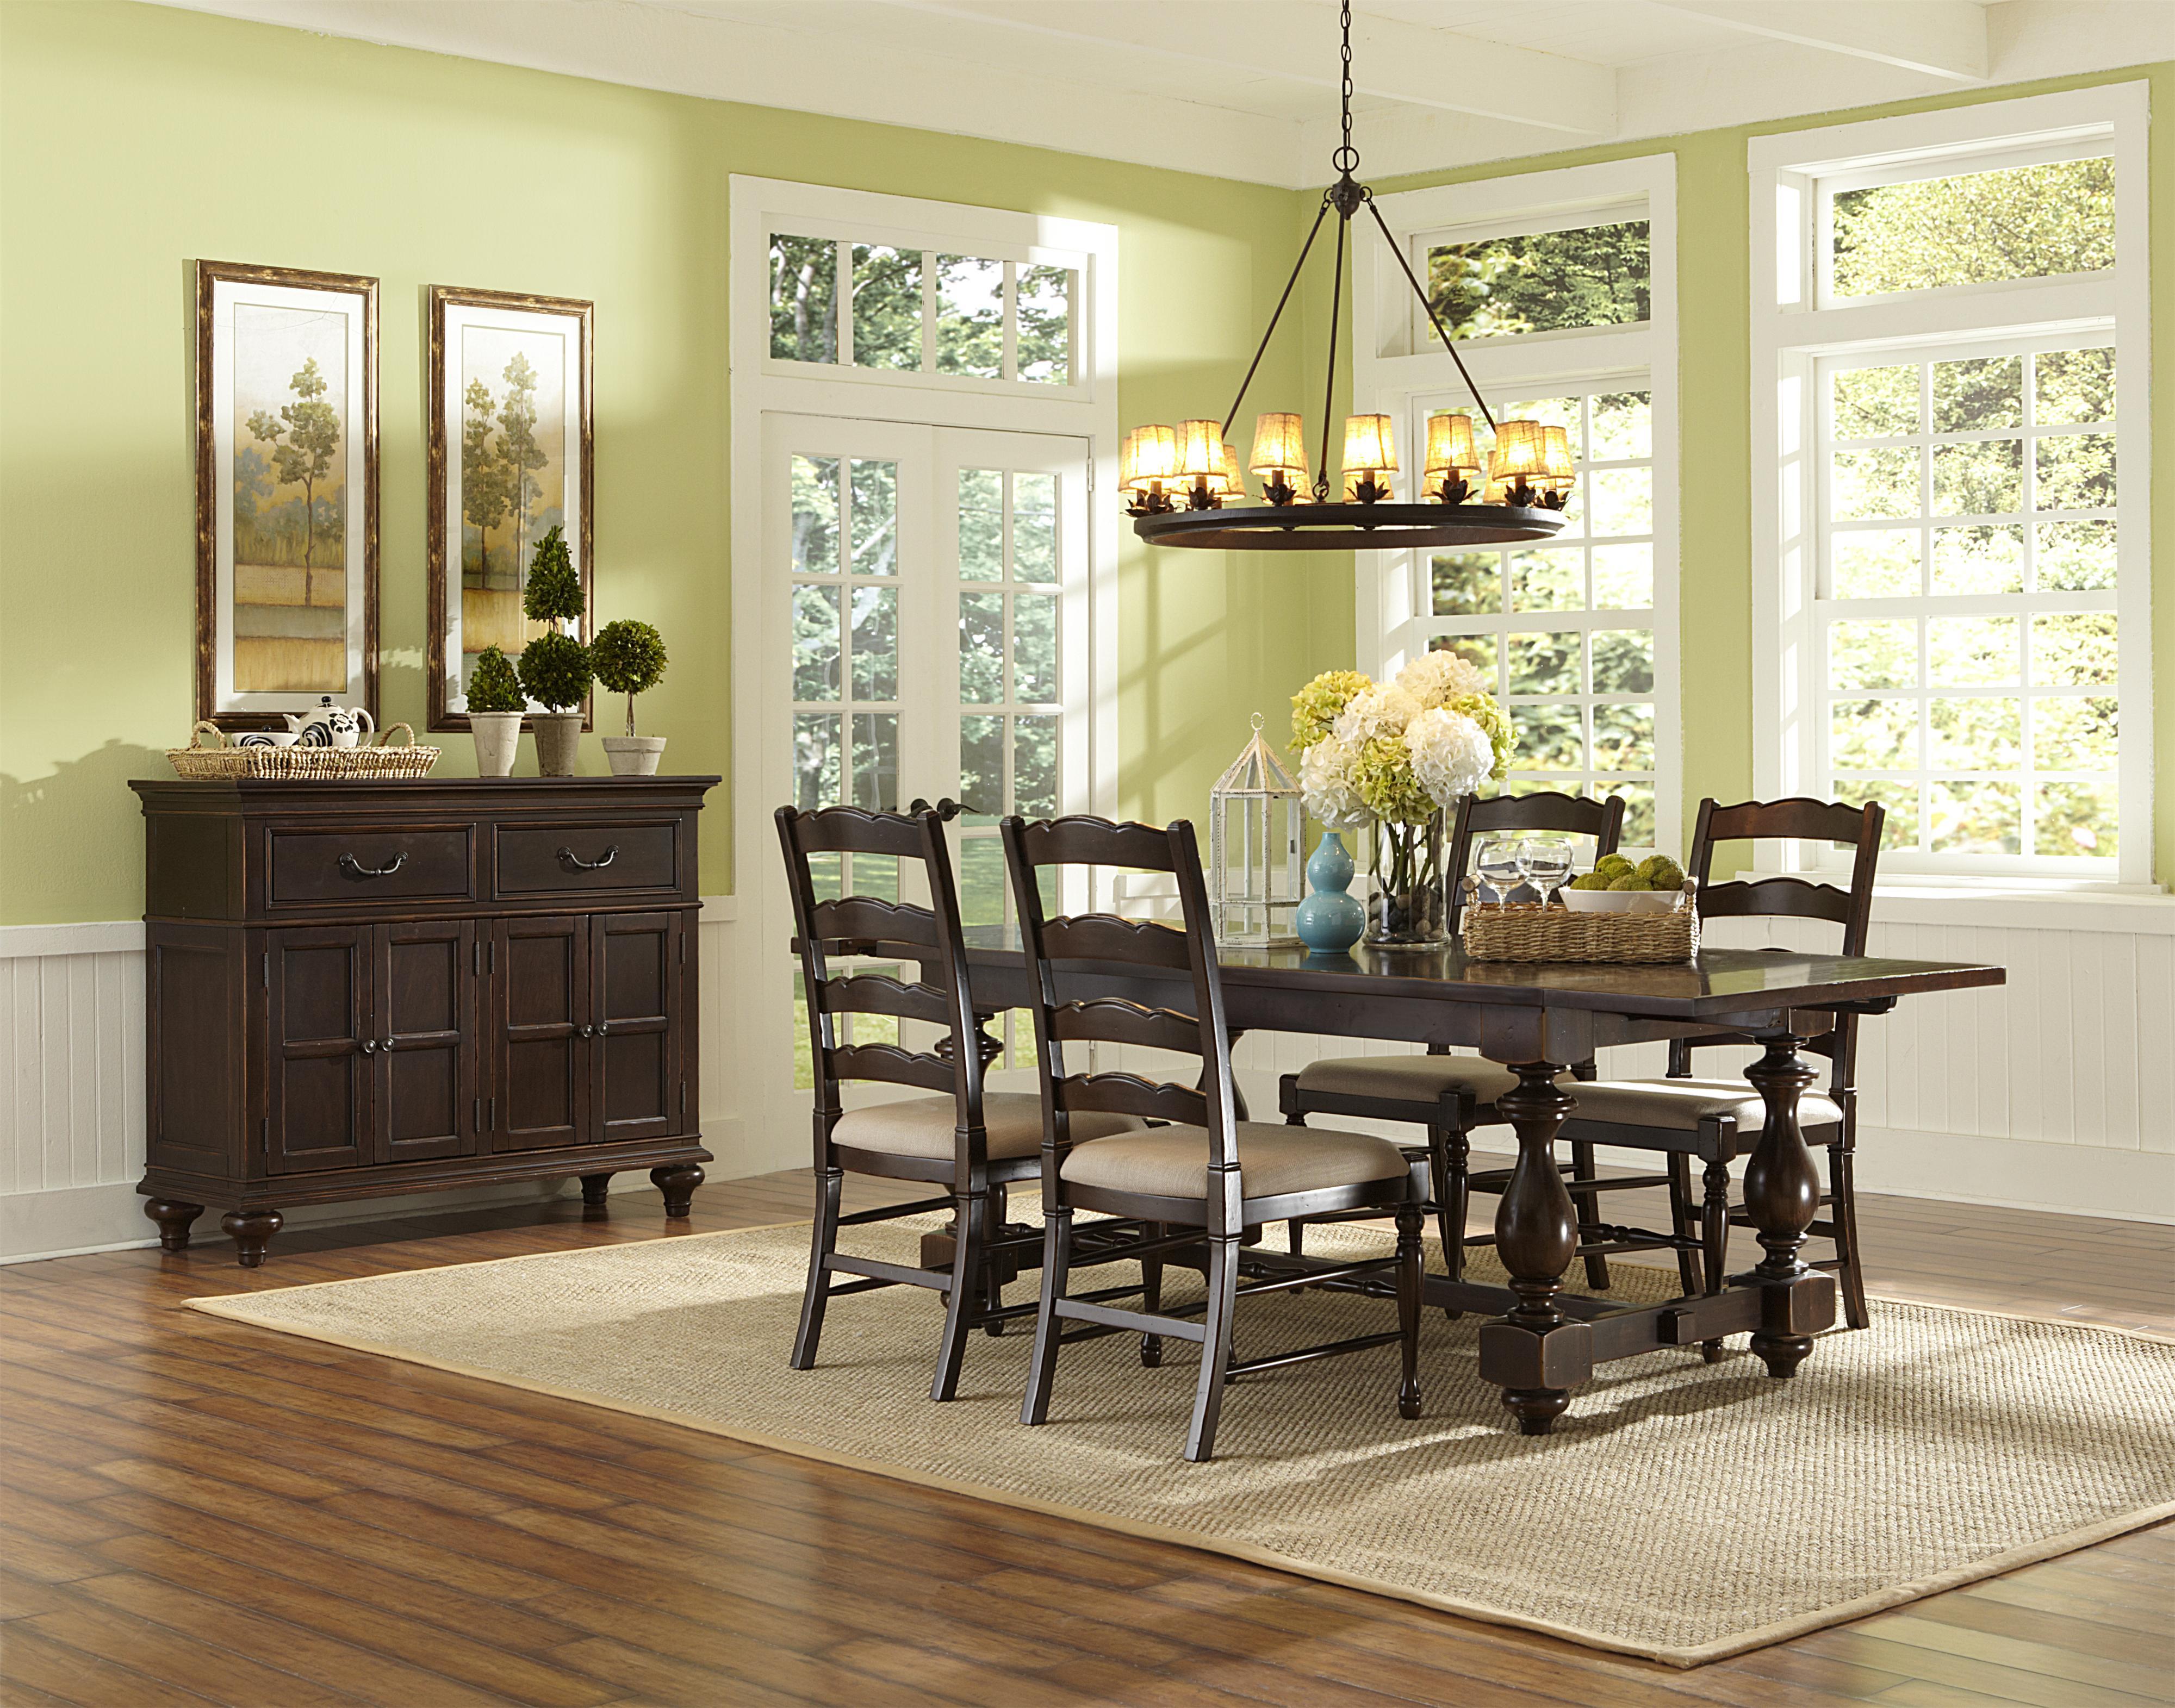 Magnussen Dining Room Furniture Magnussen Home Walton  : 20loren20 201088781763d2470 krl b2 from www.amlibgroup.com size 4000 x 3142 jpeg 1393kB